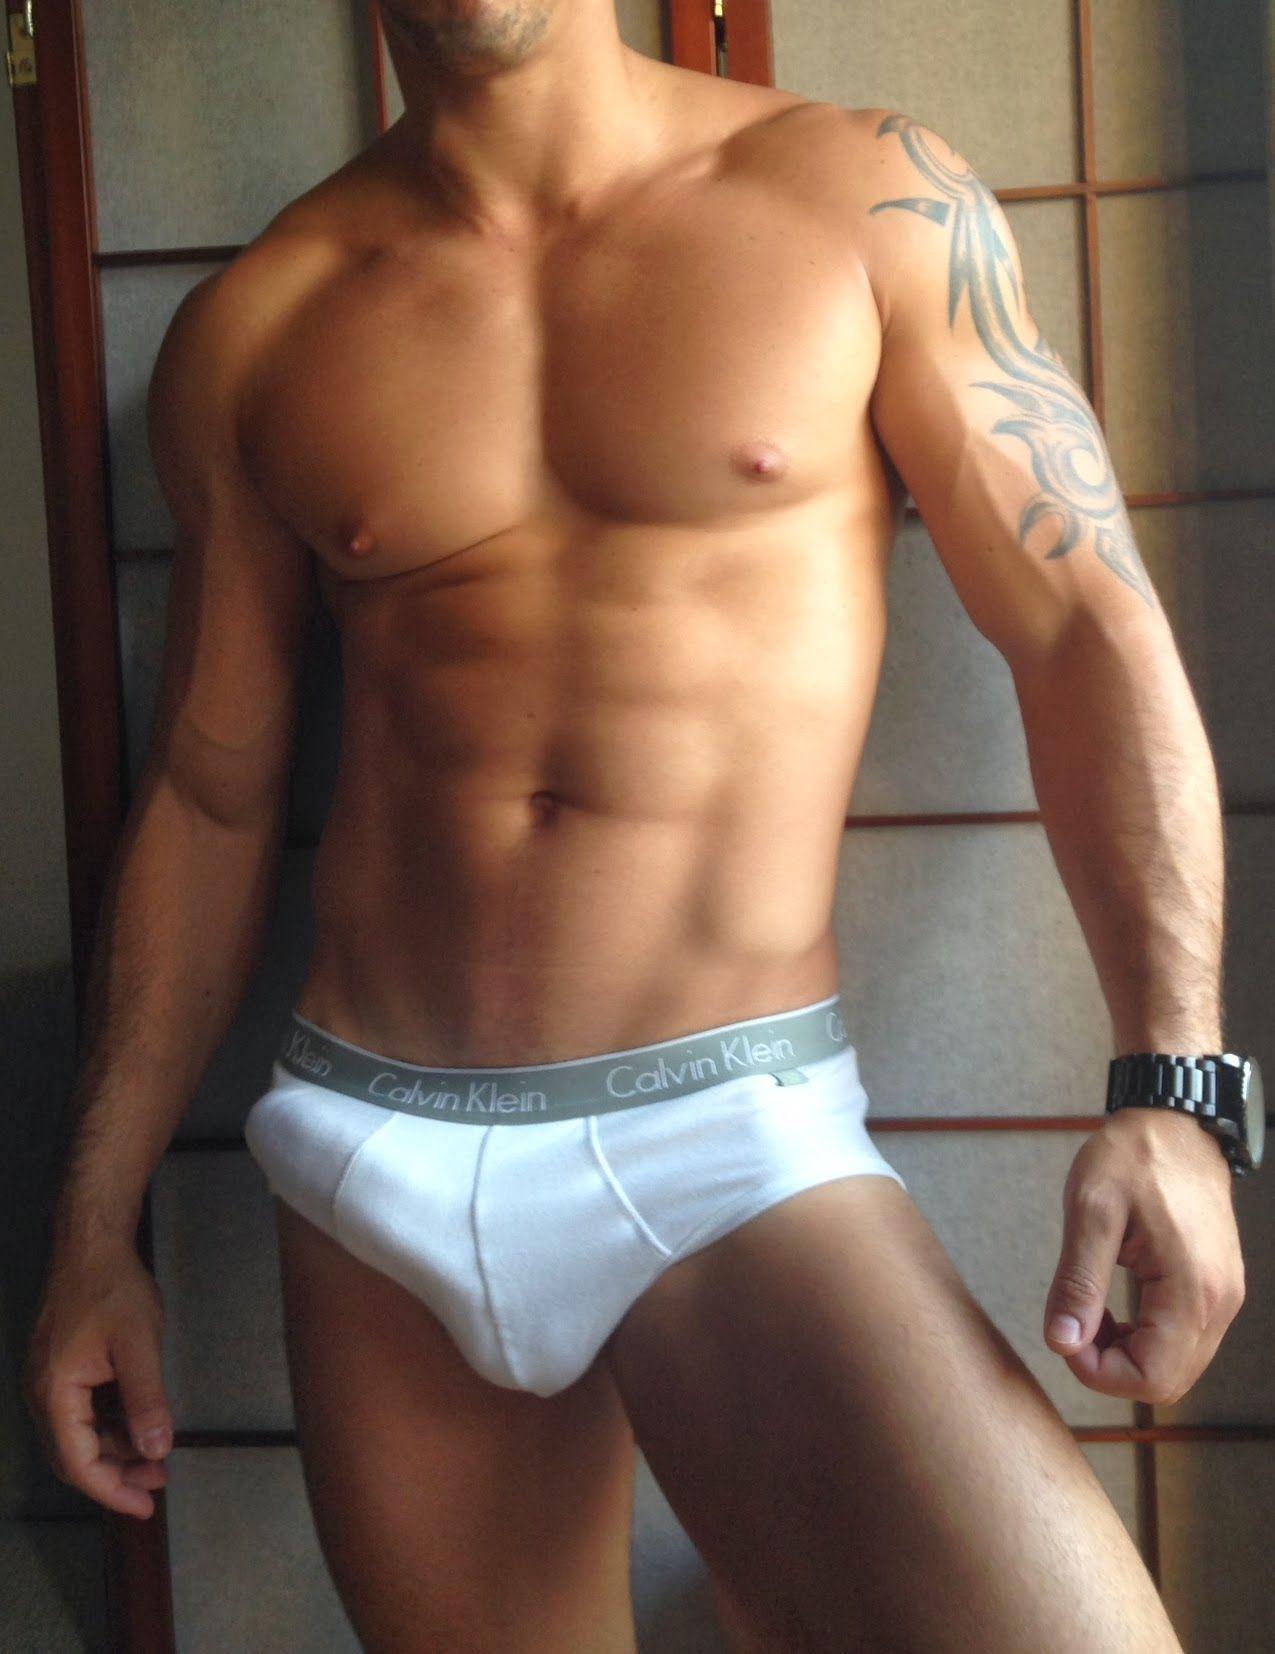 hd close up nude male pics